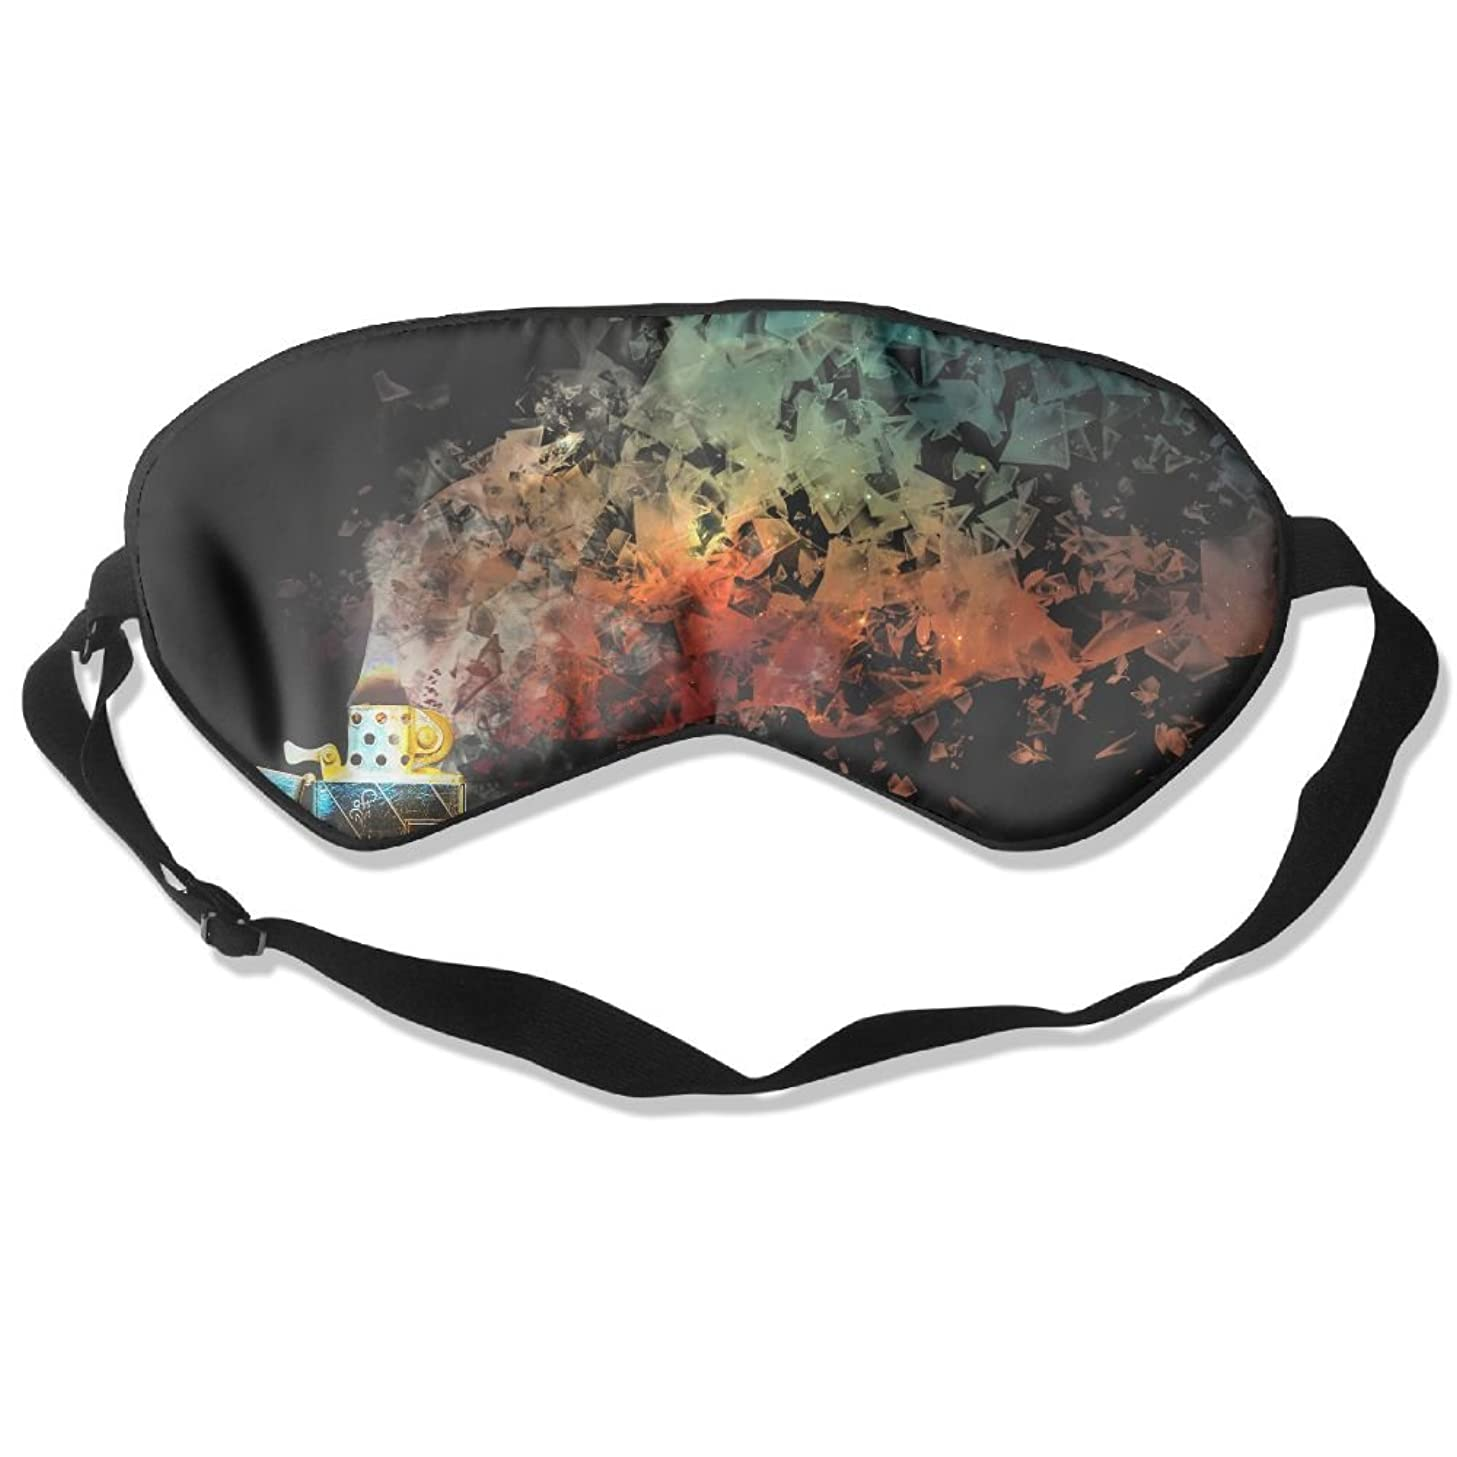 Goods Shops Mulberry Silk Sleeping Masks Lighter Eyepatch Eye Masks Adjustable Sleeping Eye Shade